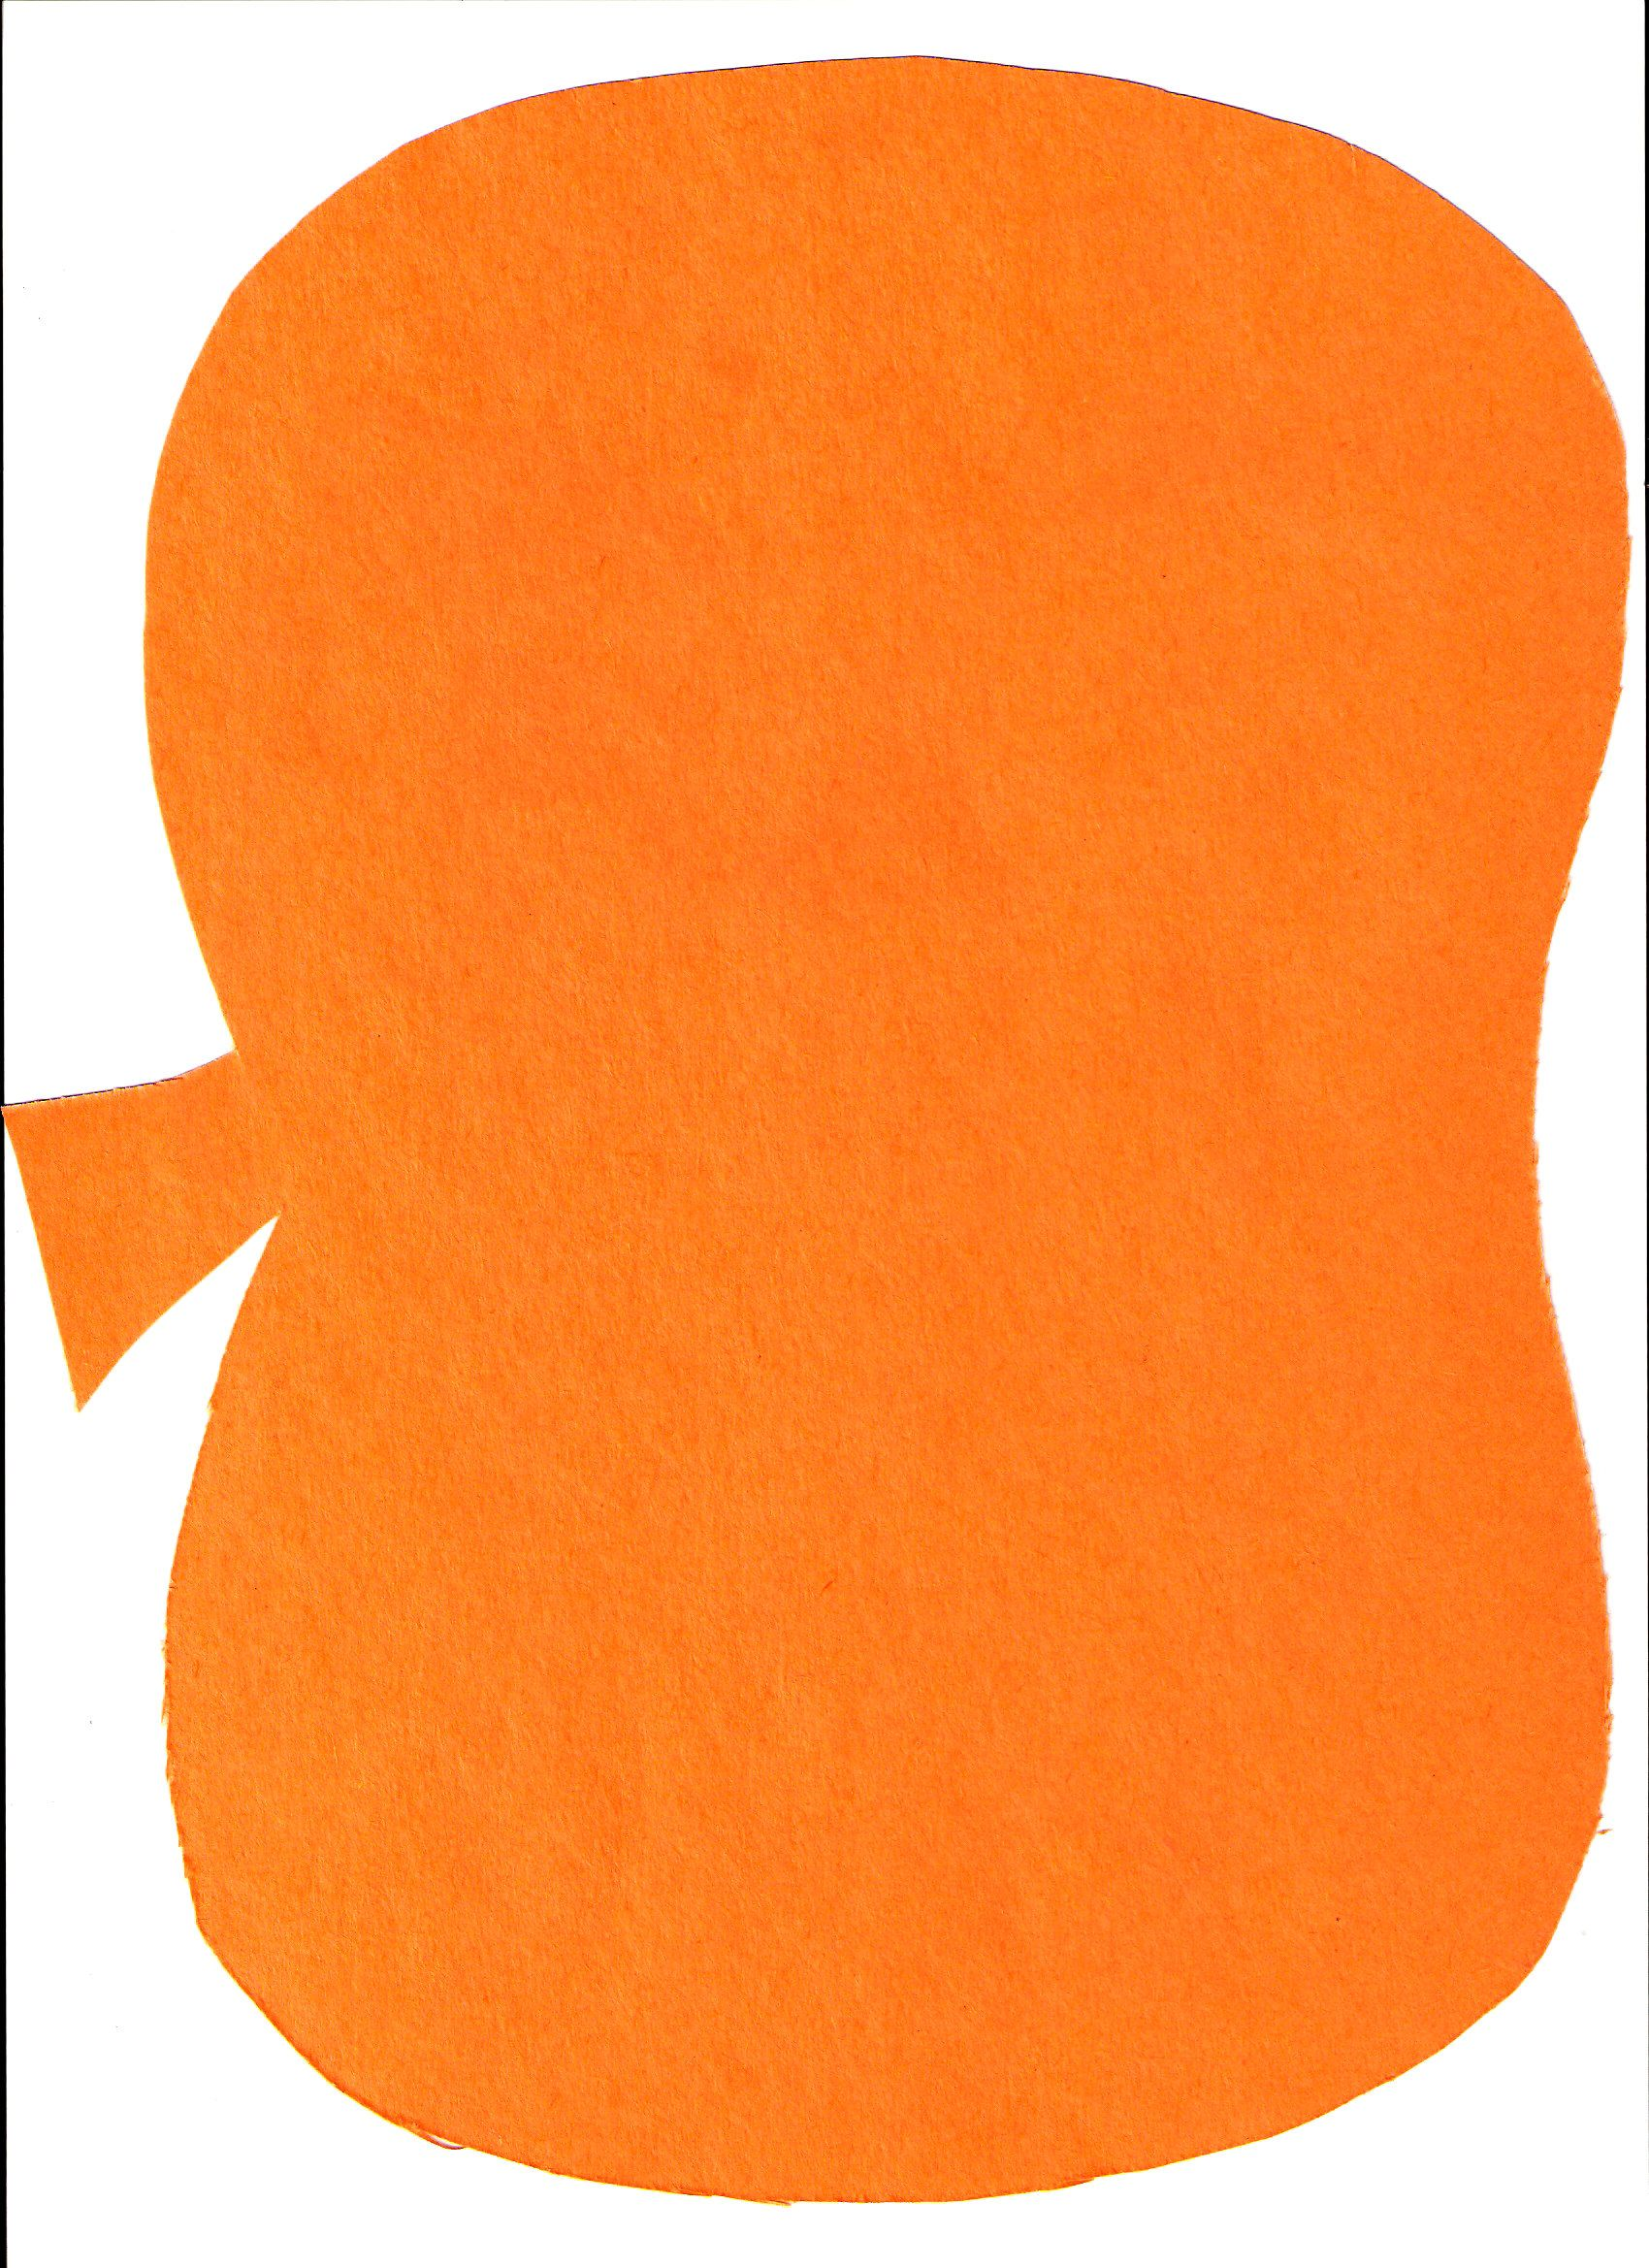 pumpkin templates to print crafts fall images pumpkin